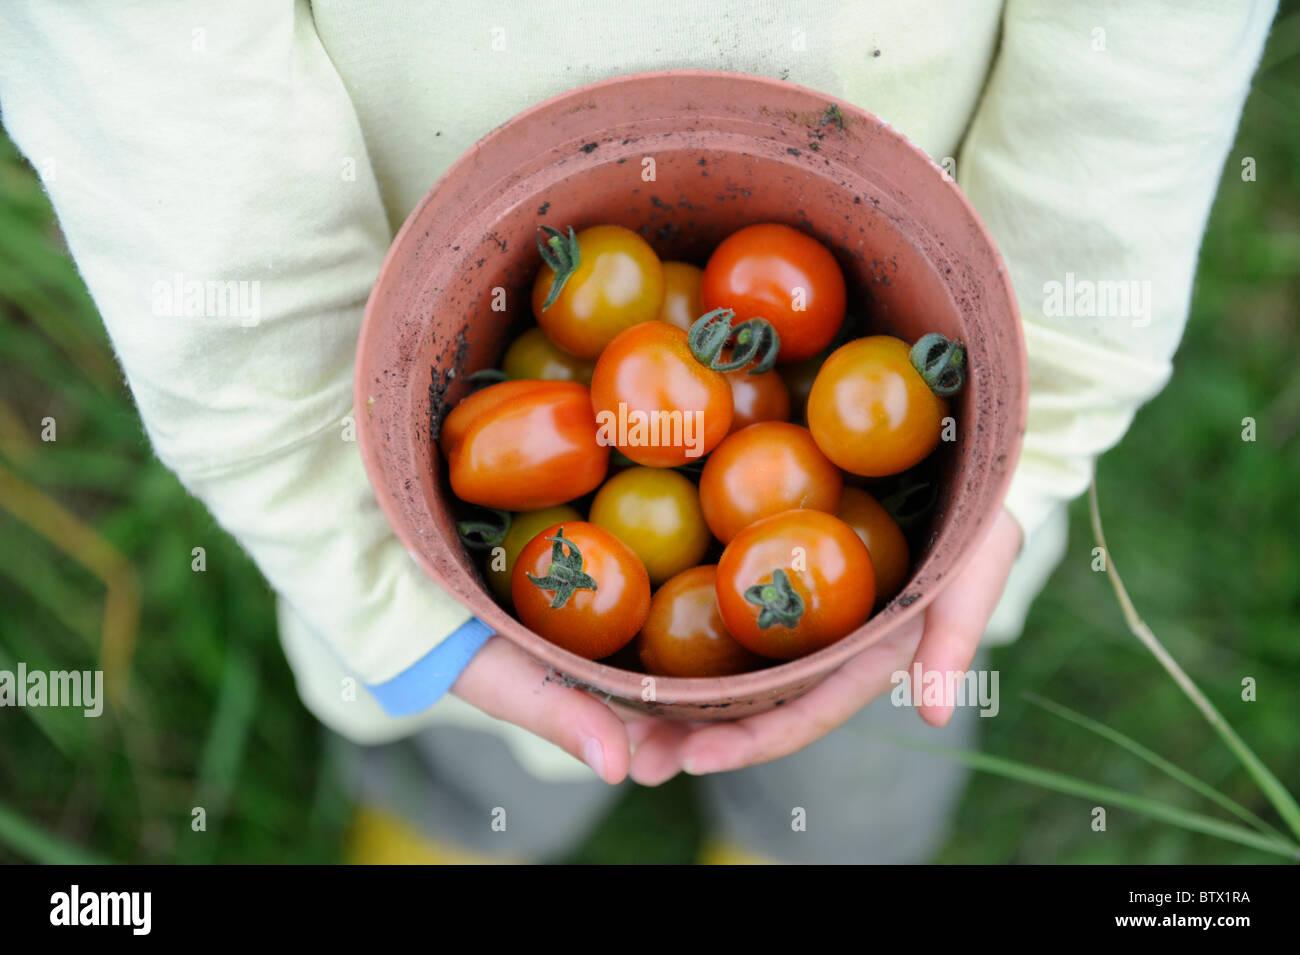 Nuevo recogi tomates en maceta Imagen De Stock